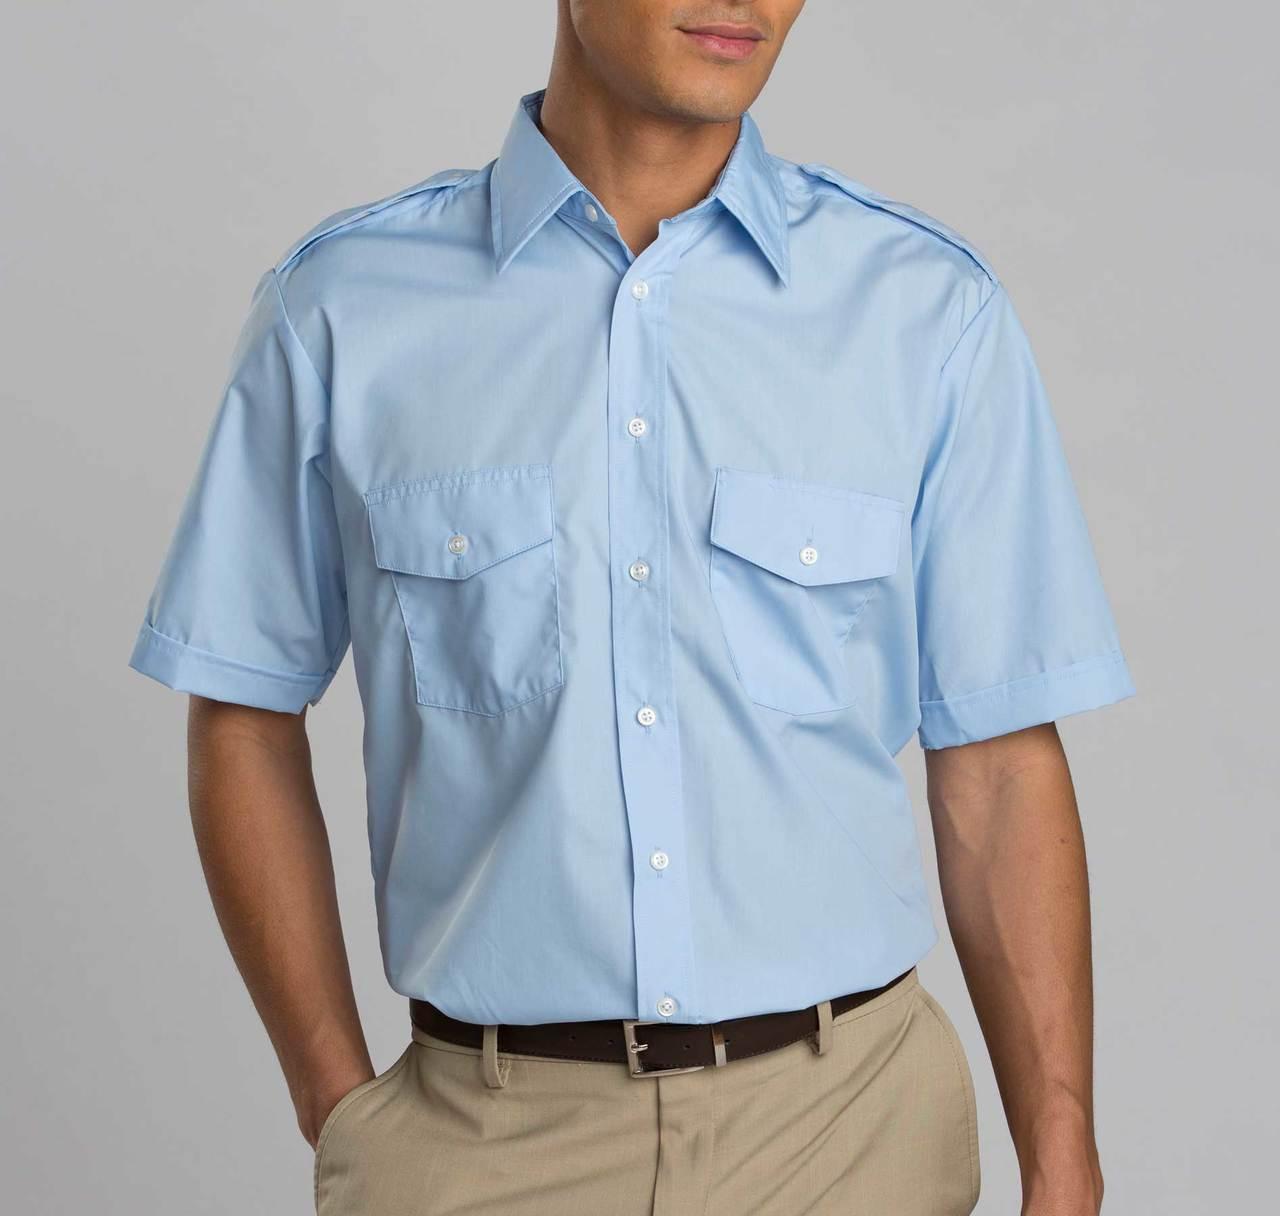 Men's Short Sleeve Navigator Shirt